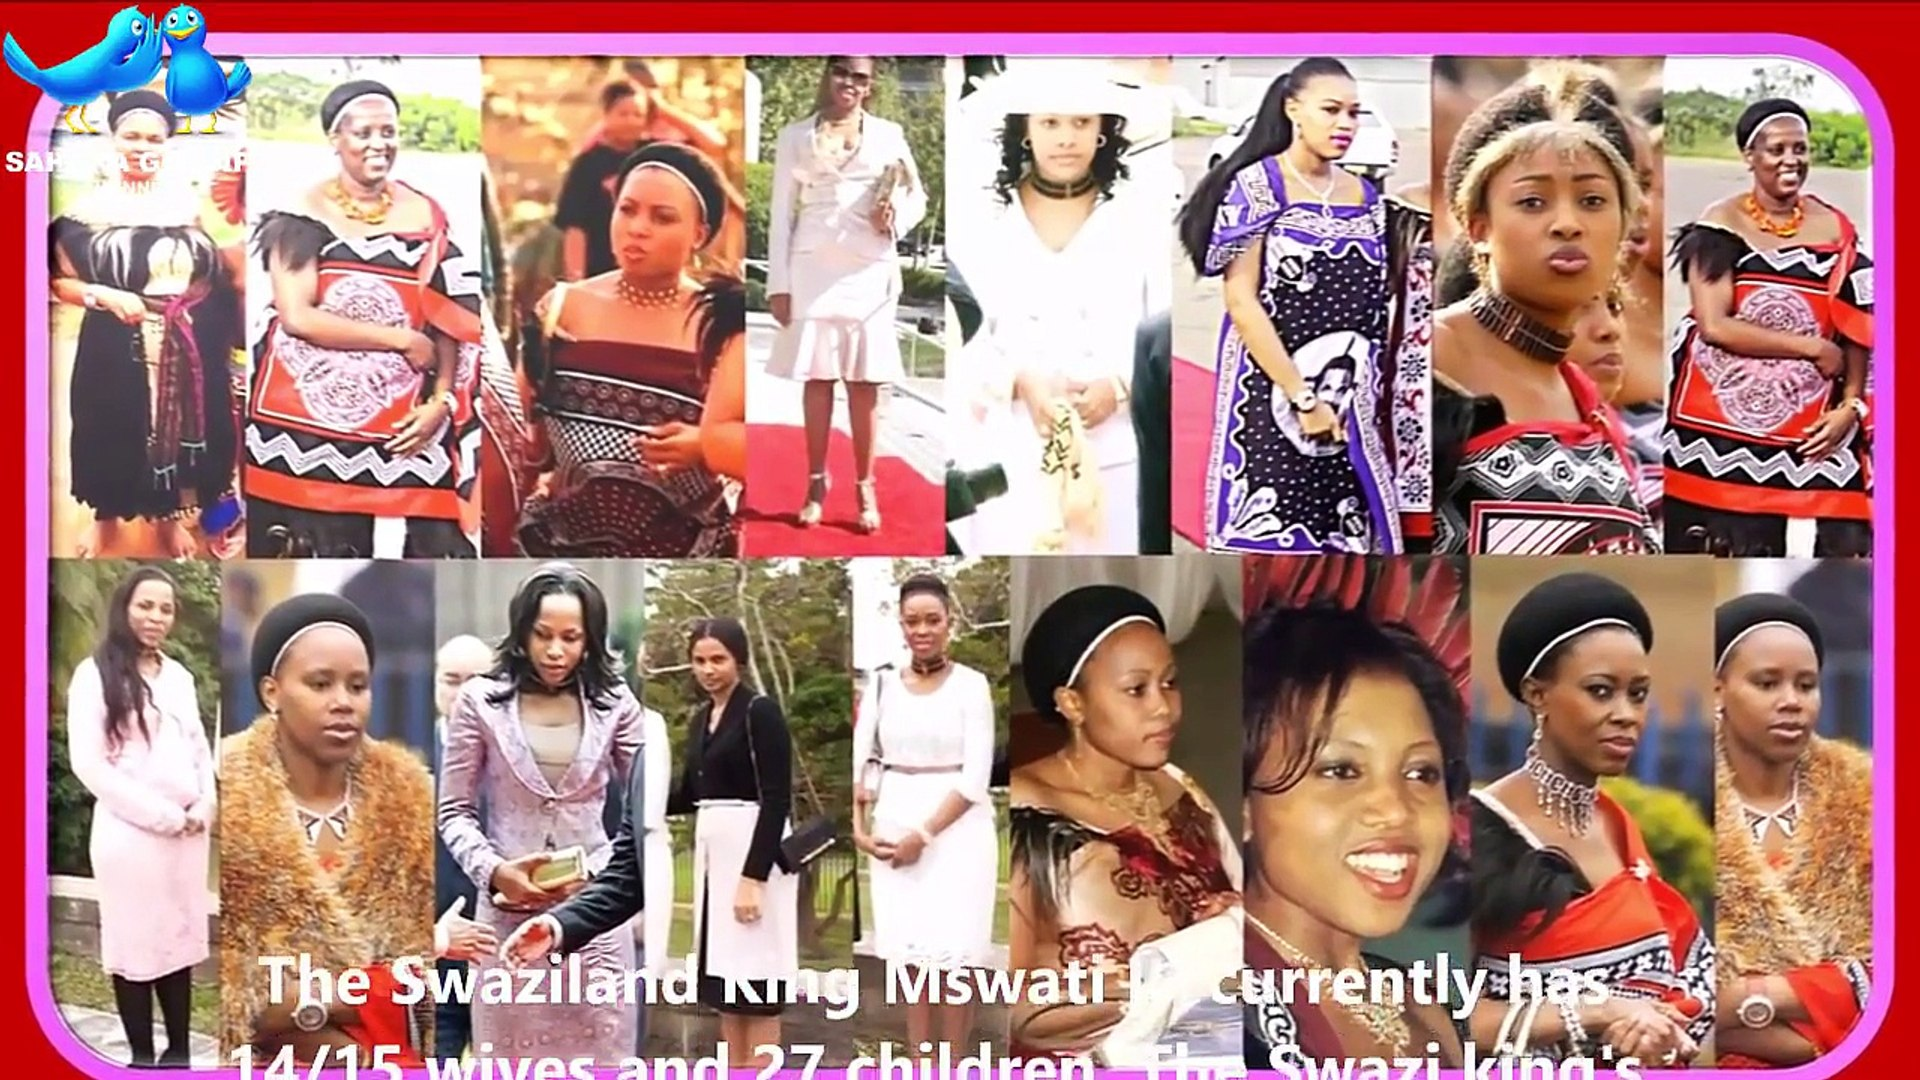 Reed Dance   Swazi King Mswati III & His 15 Queens   Rat-Race In Swazi Royal Palace!